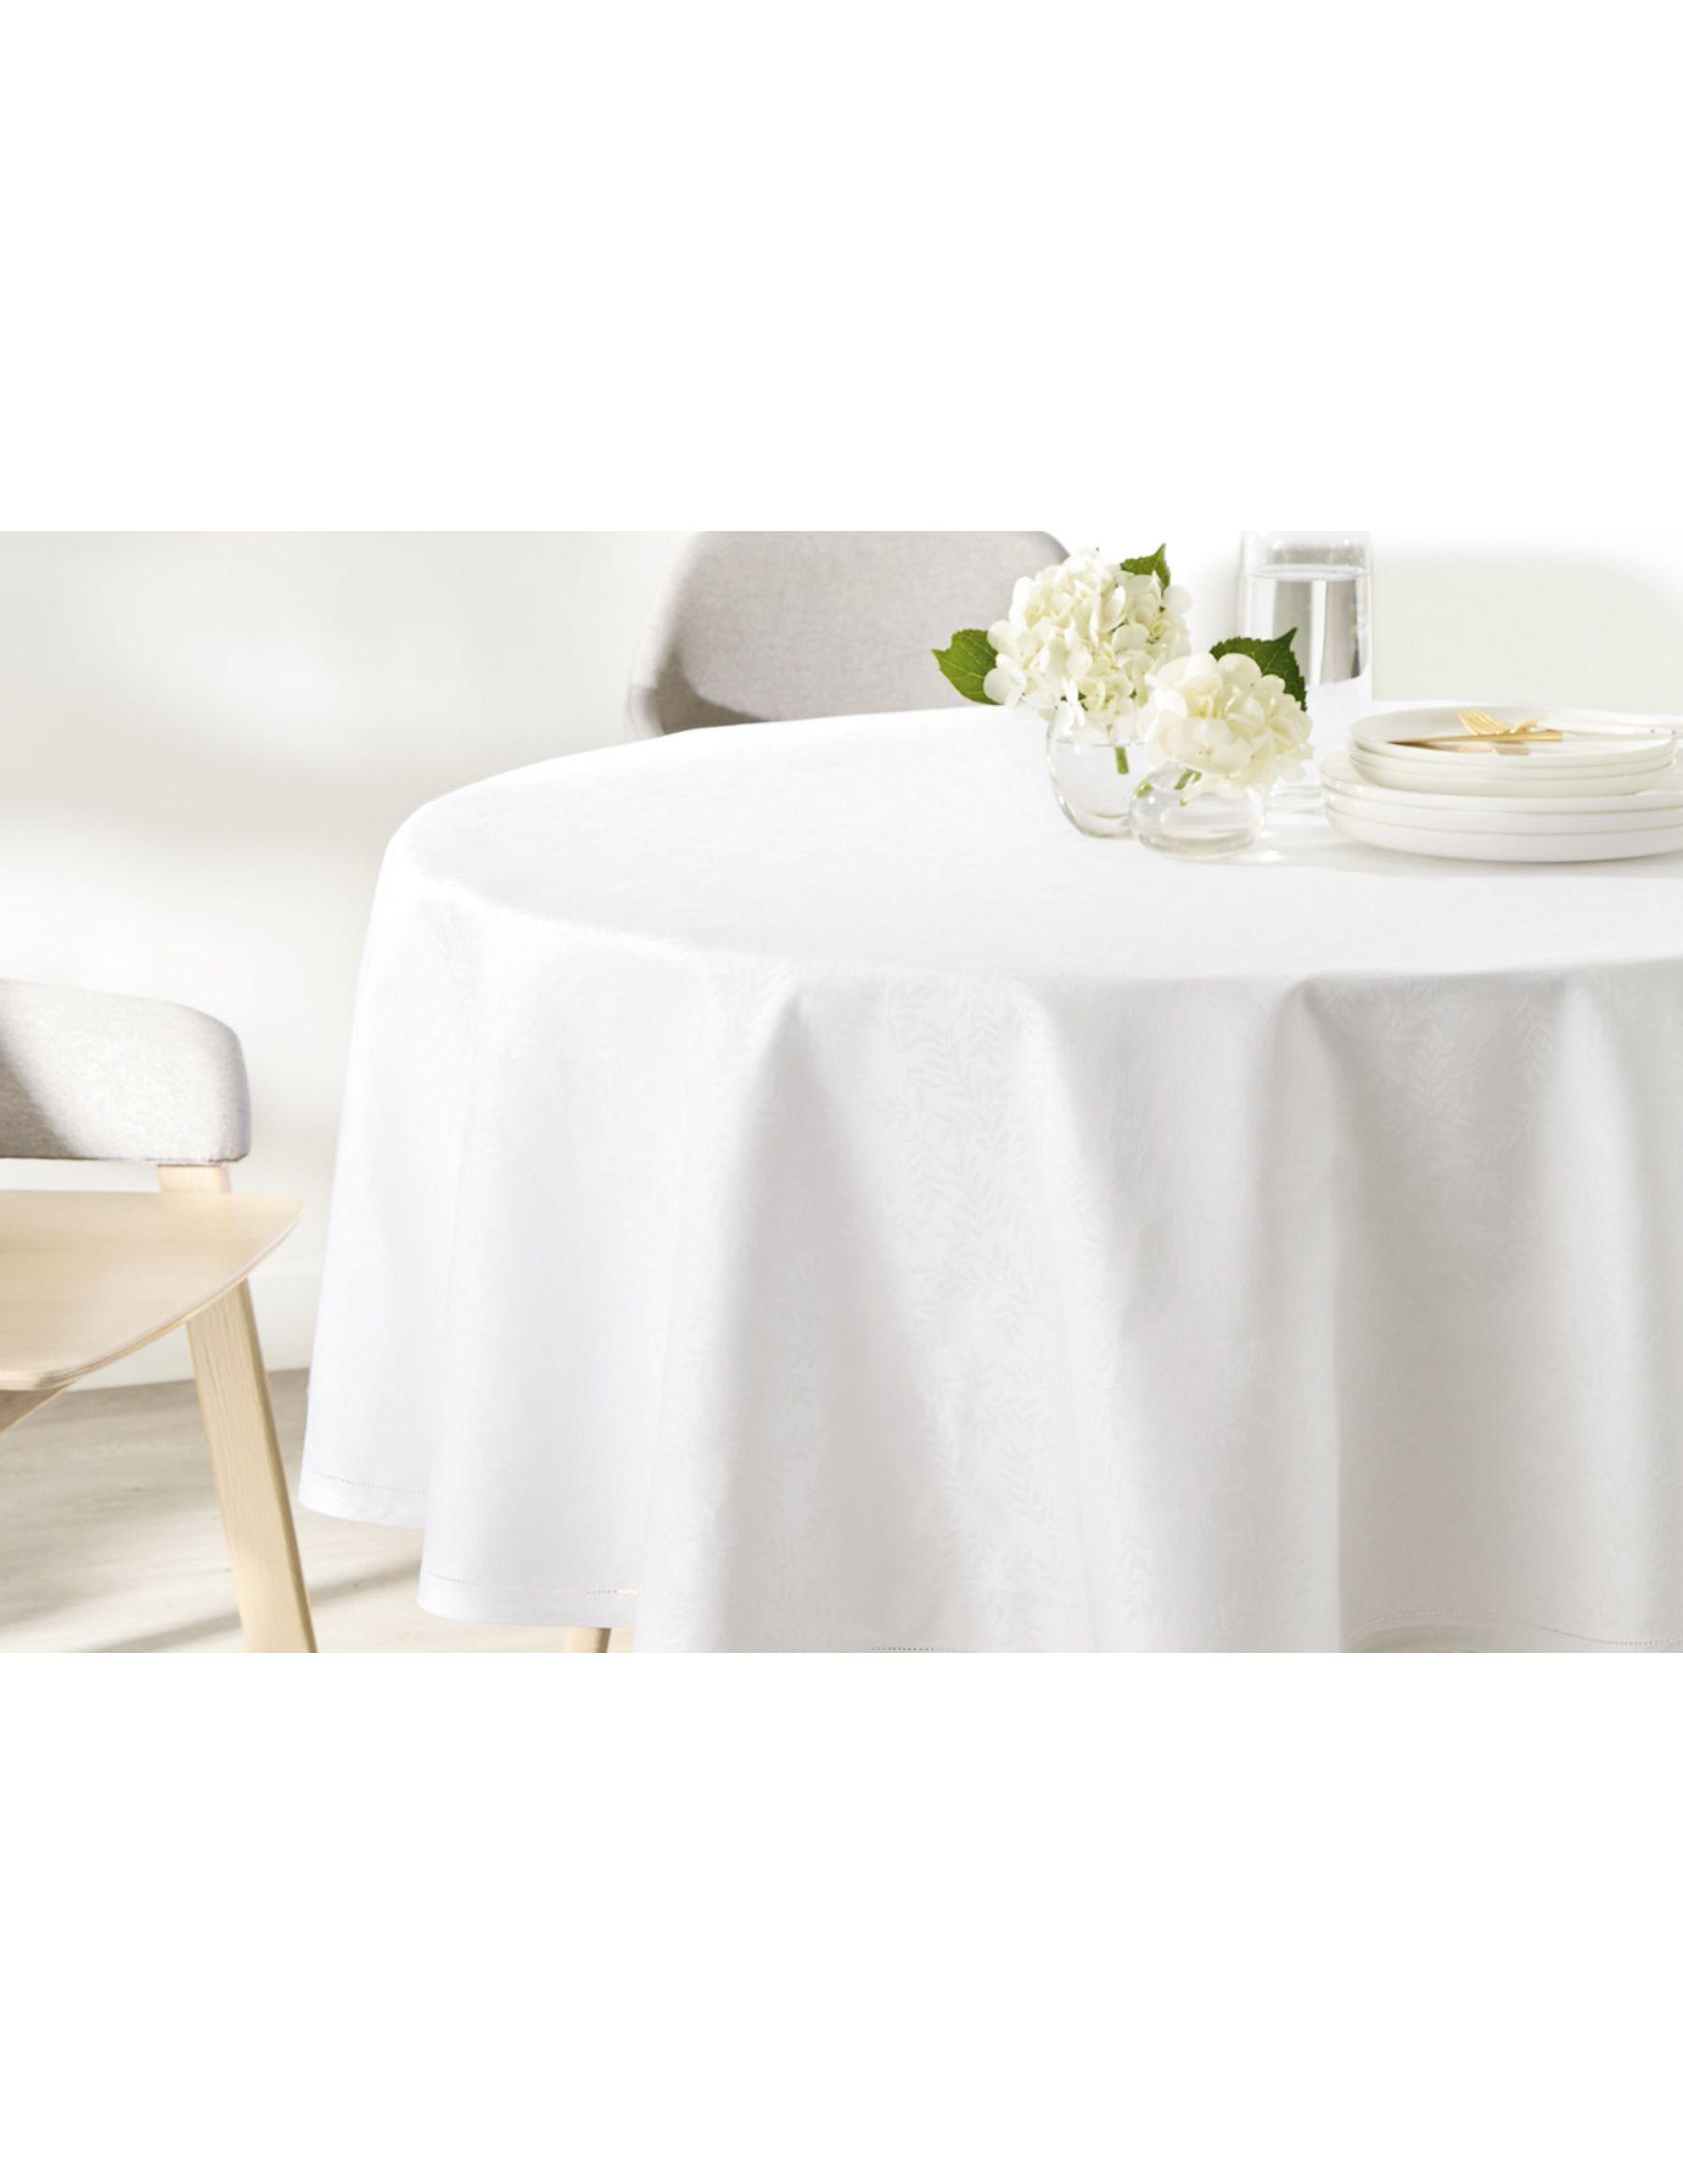 David Jones - Sheridan GANDON ROUND TABLE CLOTH